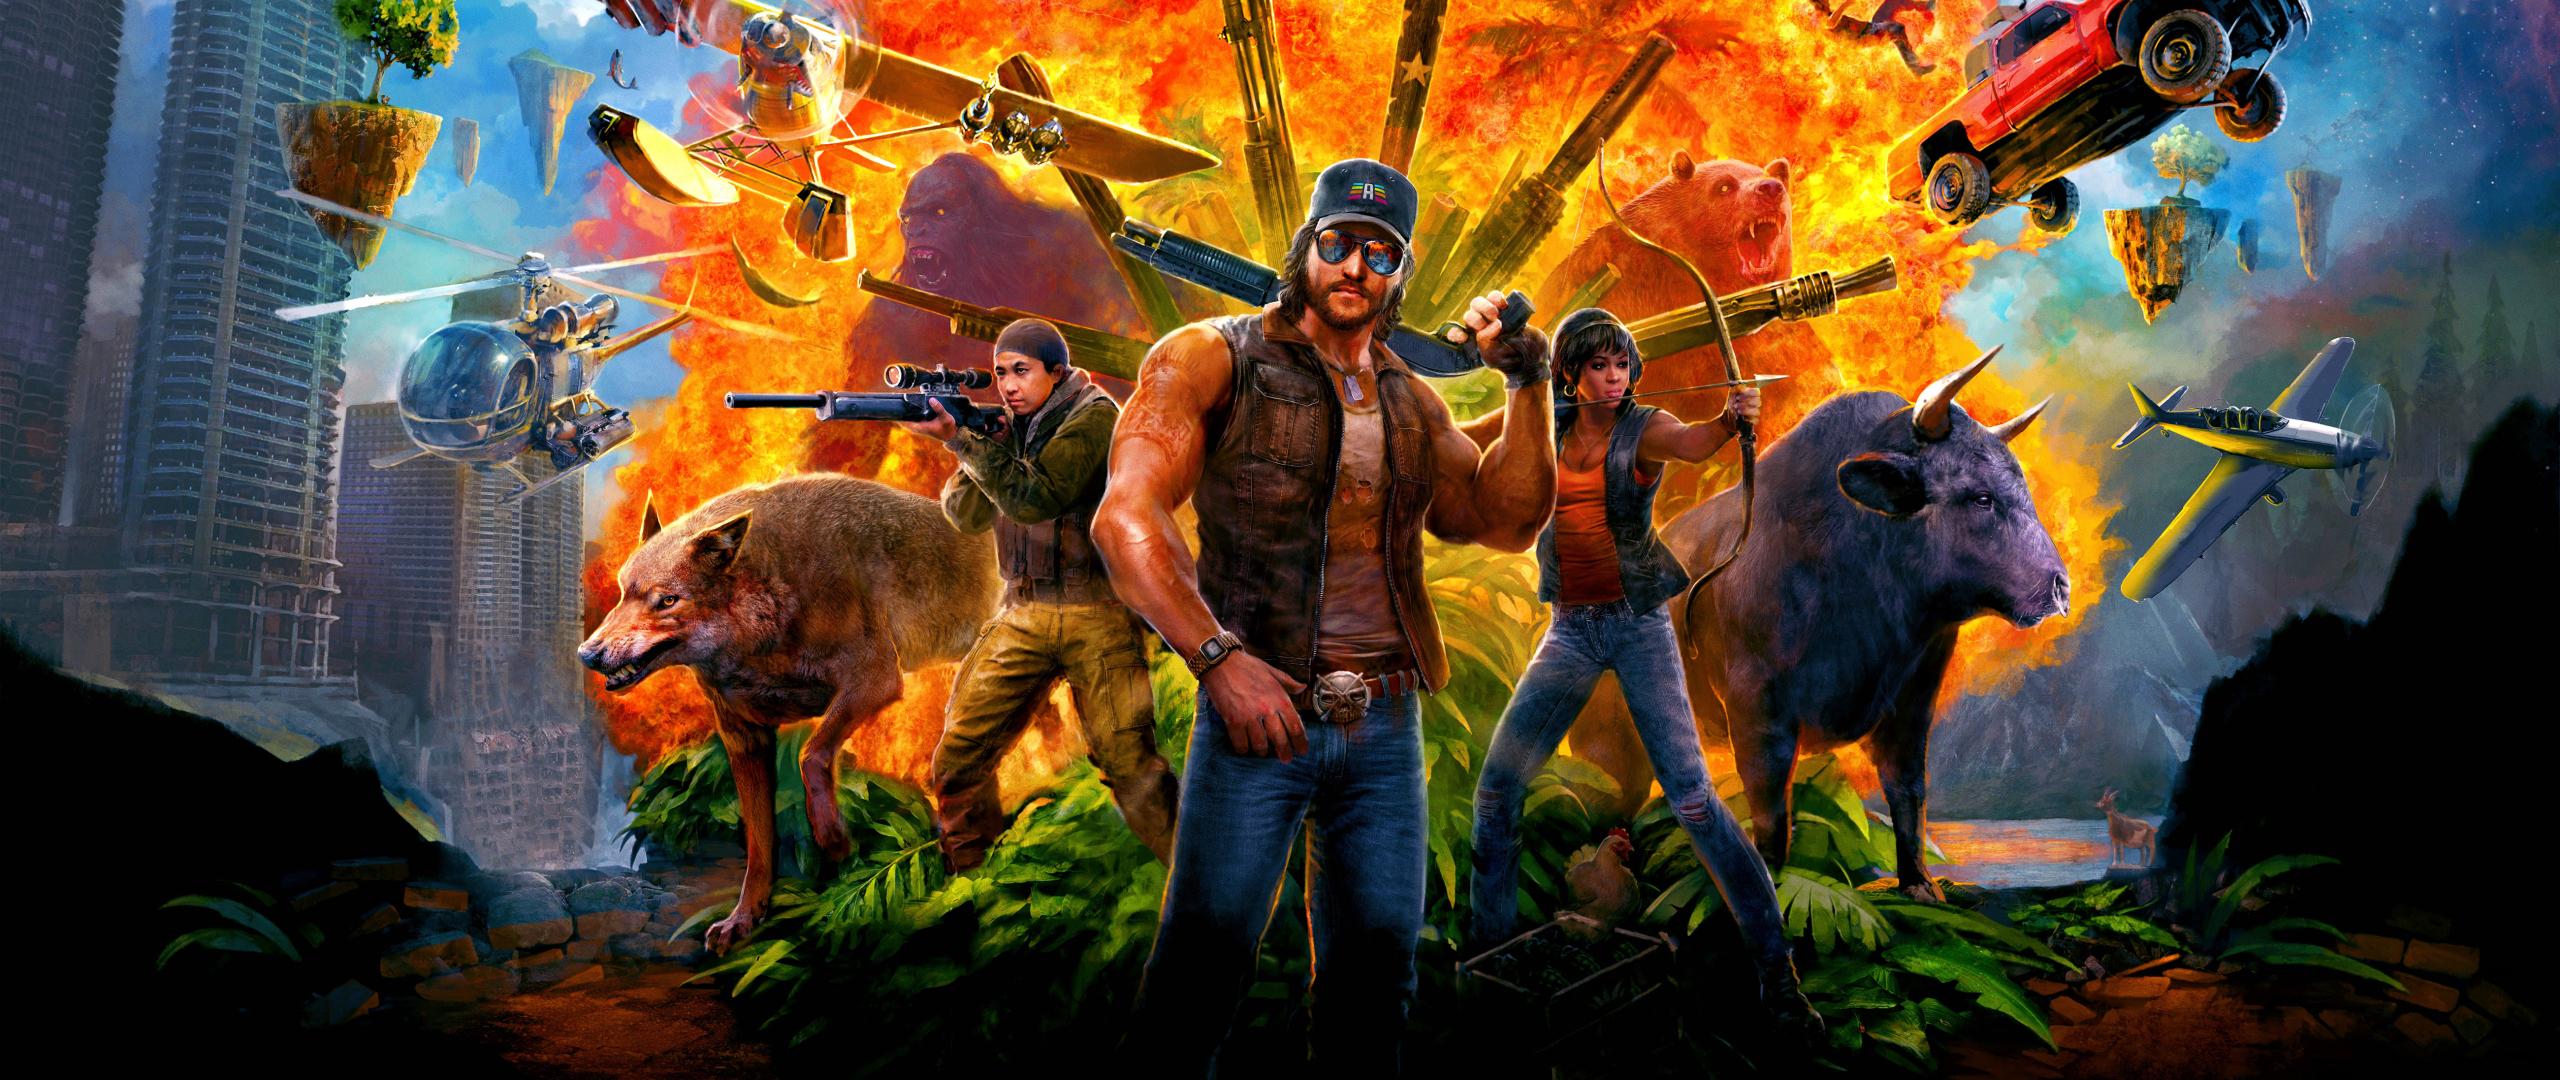 2560x1080 Far Cry 5 Game 2560x1080 Resolution Wallpaper Hd Games